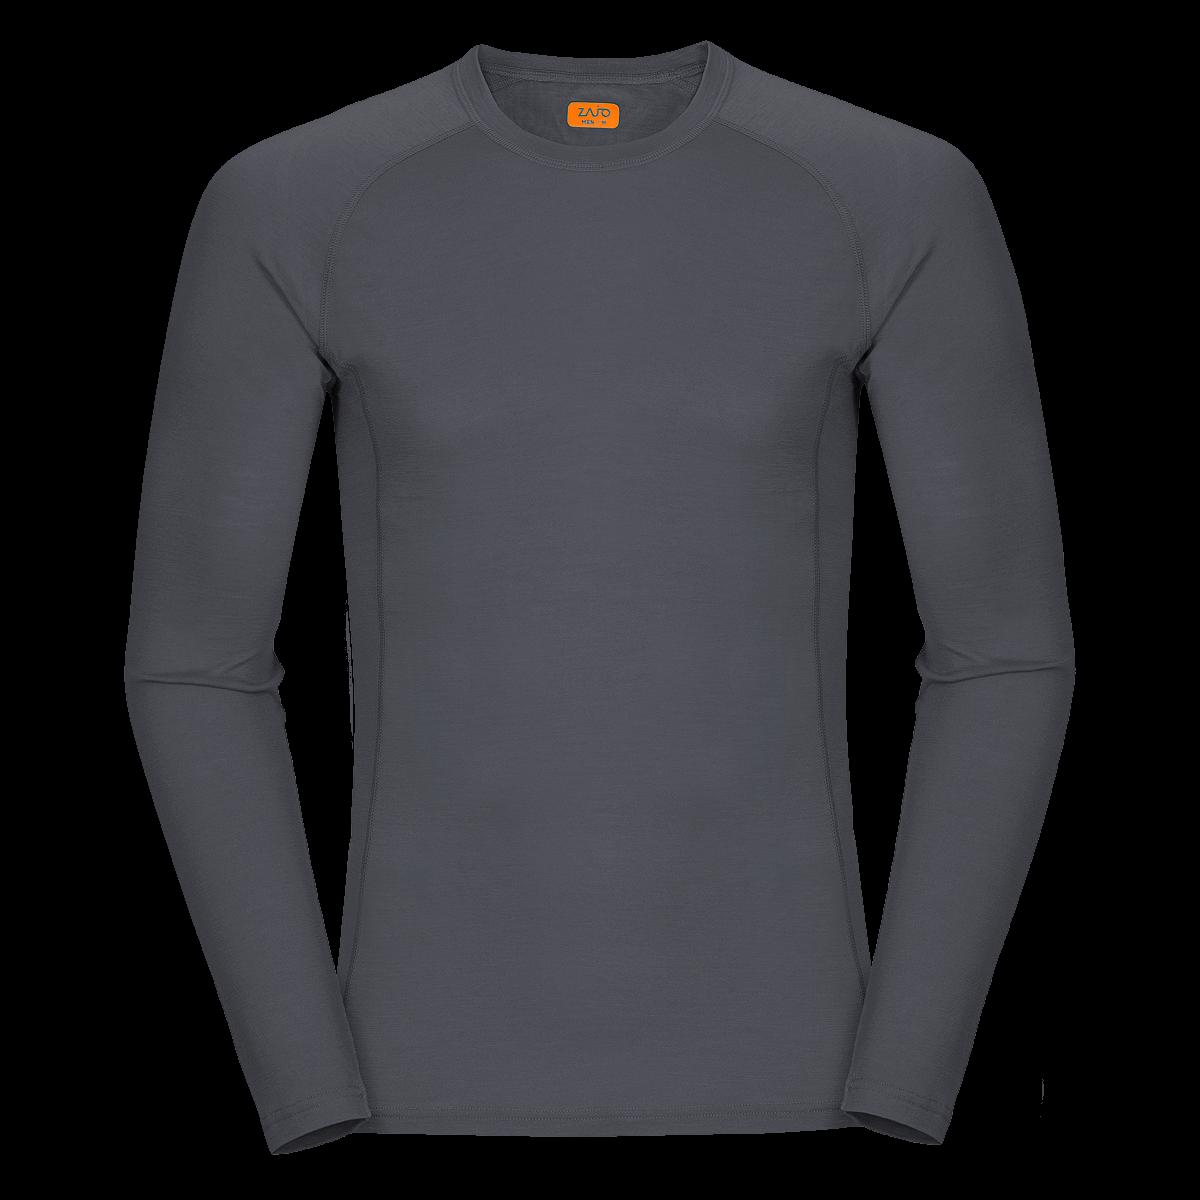 99dccdc1a Zajo Bjorn Merino Tshirt LS Gray - SPORTCOM Outdoor